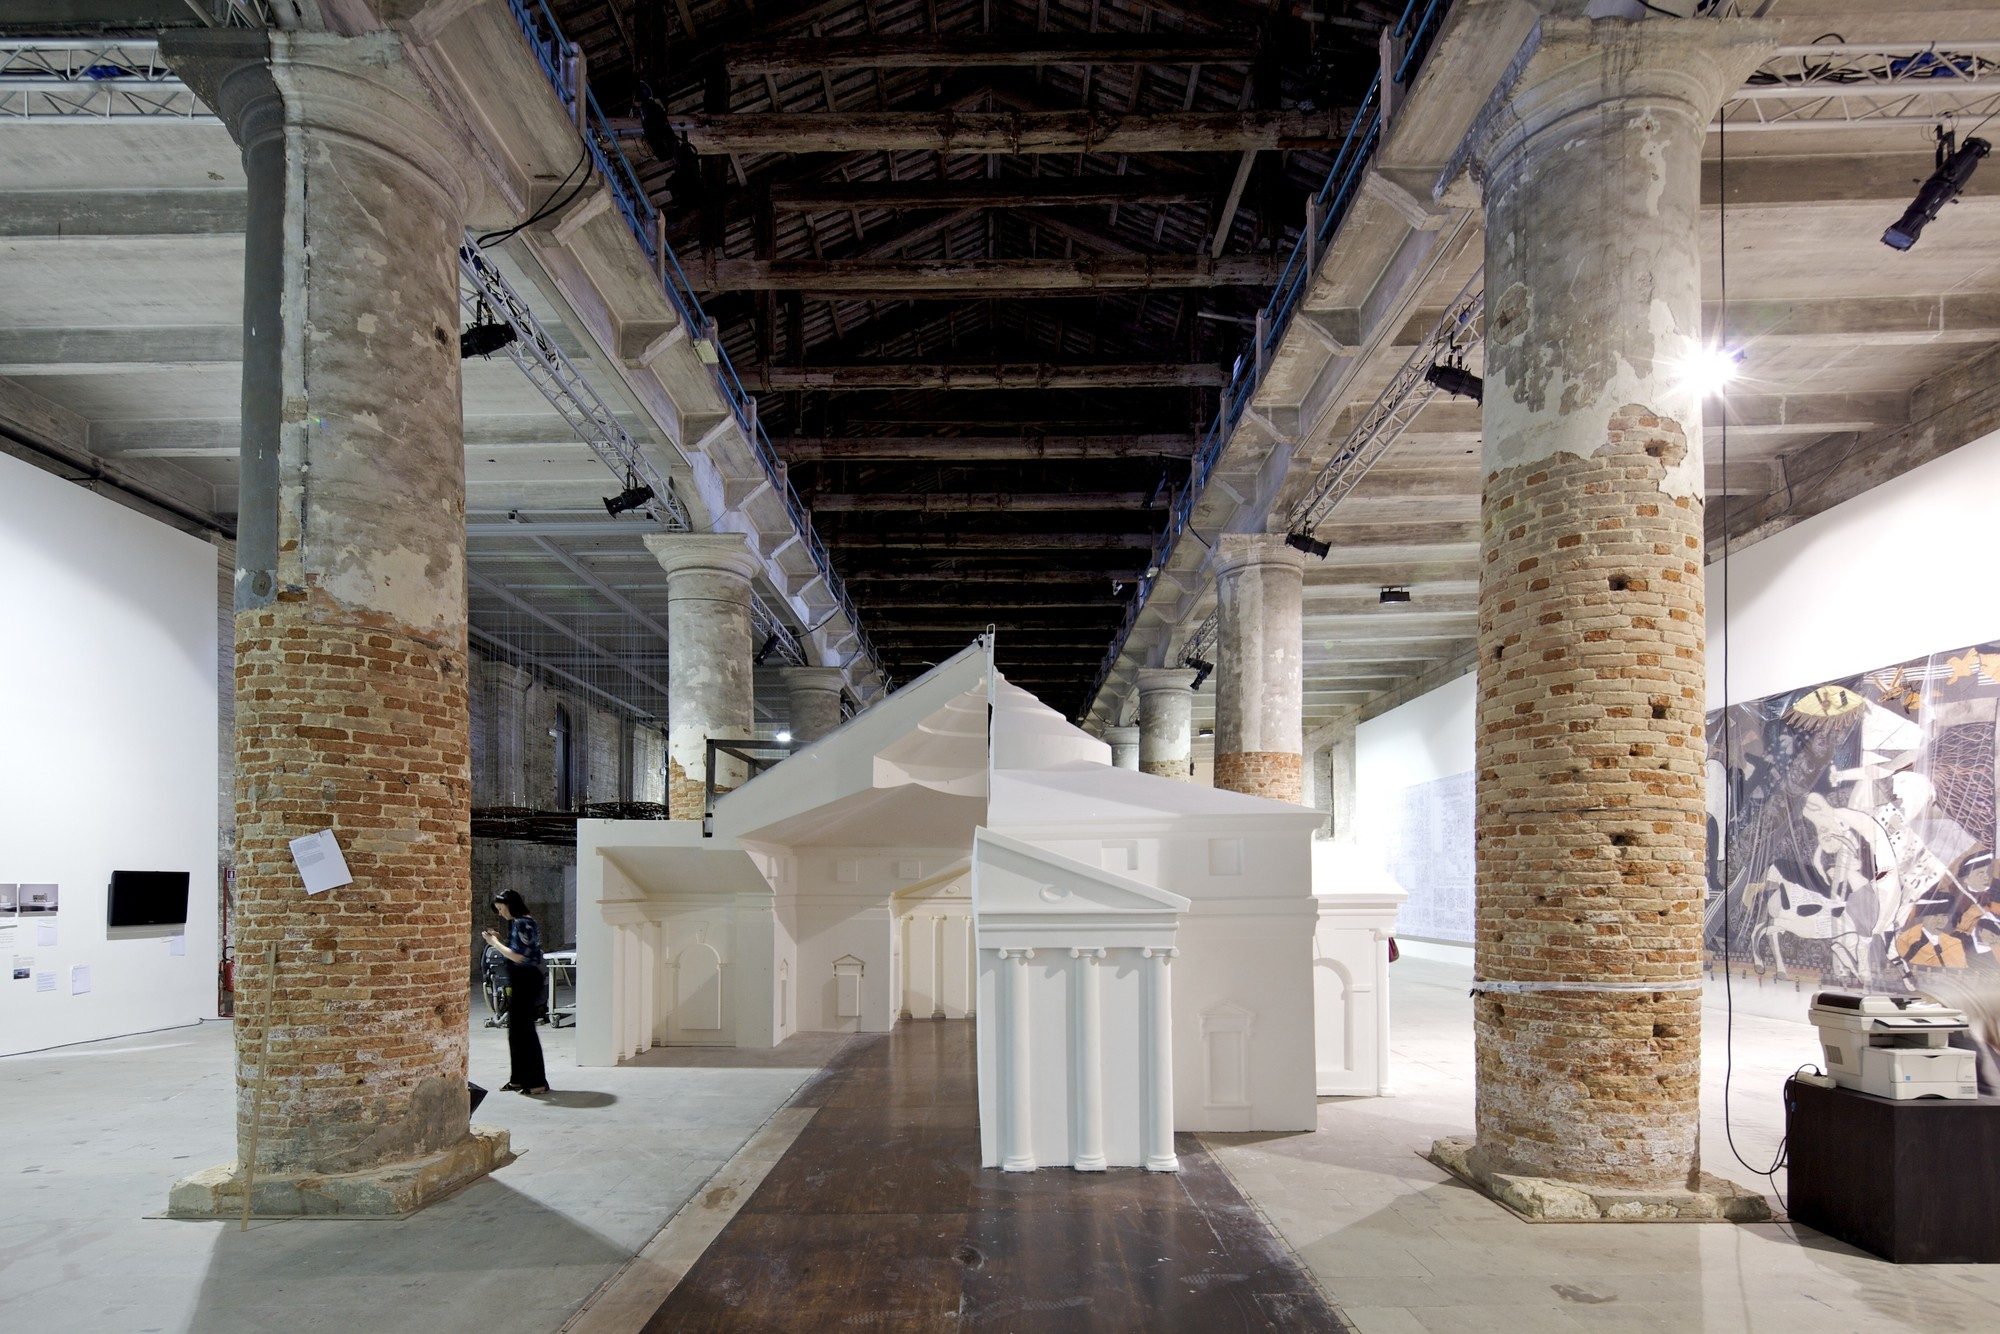 Bienal de Venecia 2012: Museum of Copying / FAT, © Nico Saieh